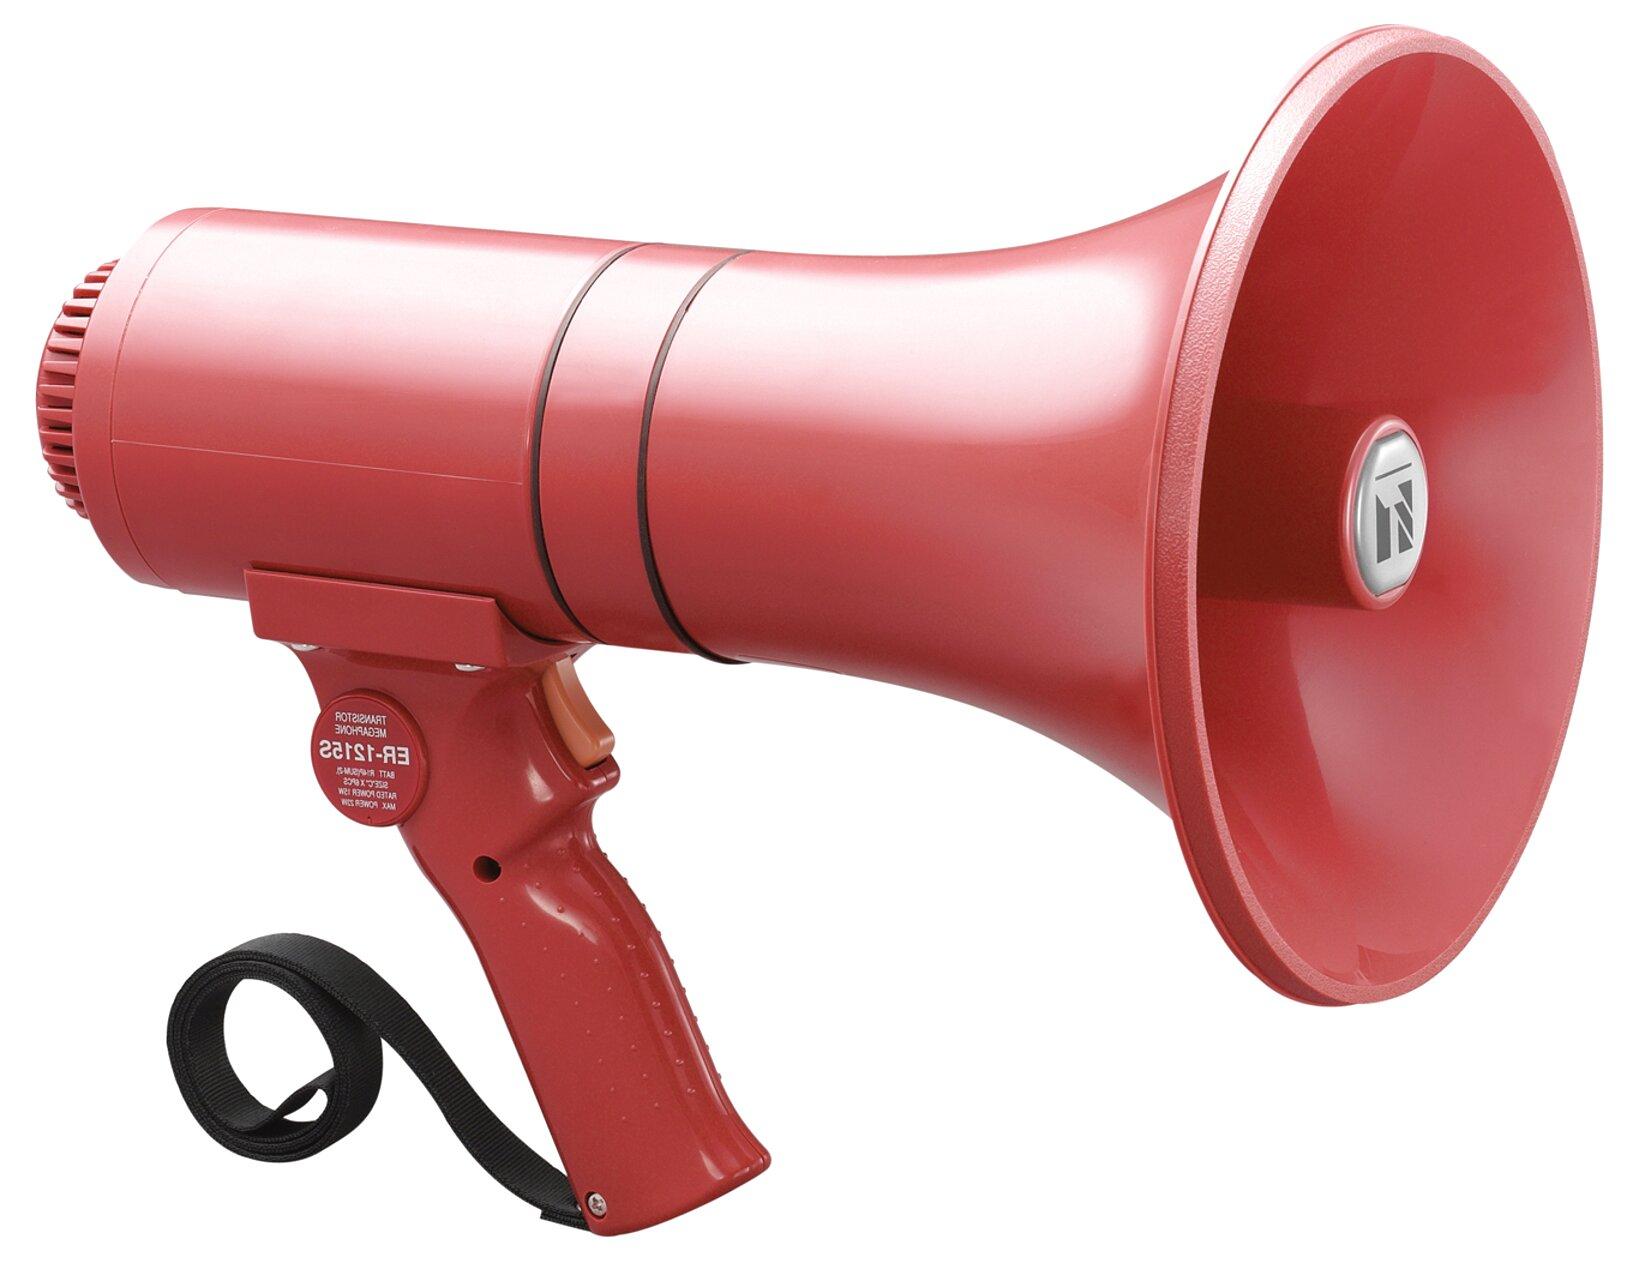 megaphone siren for sale